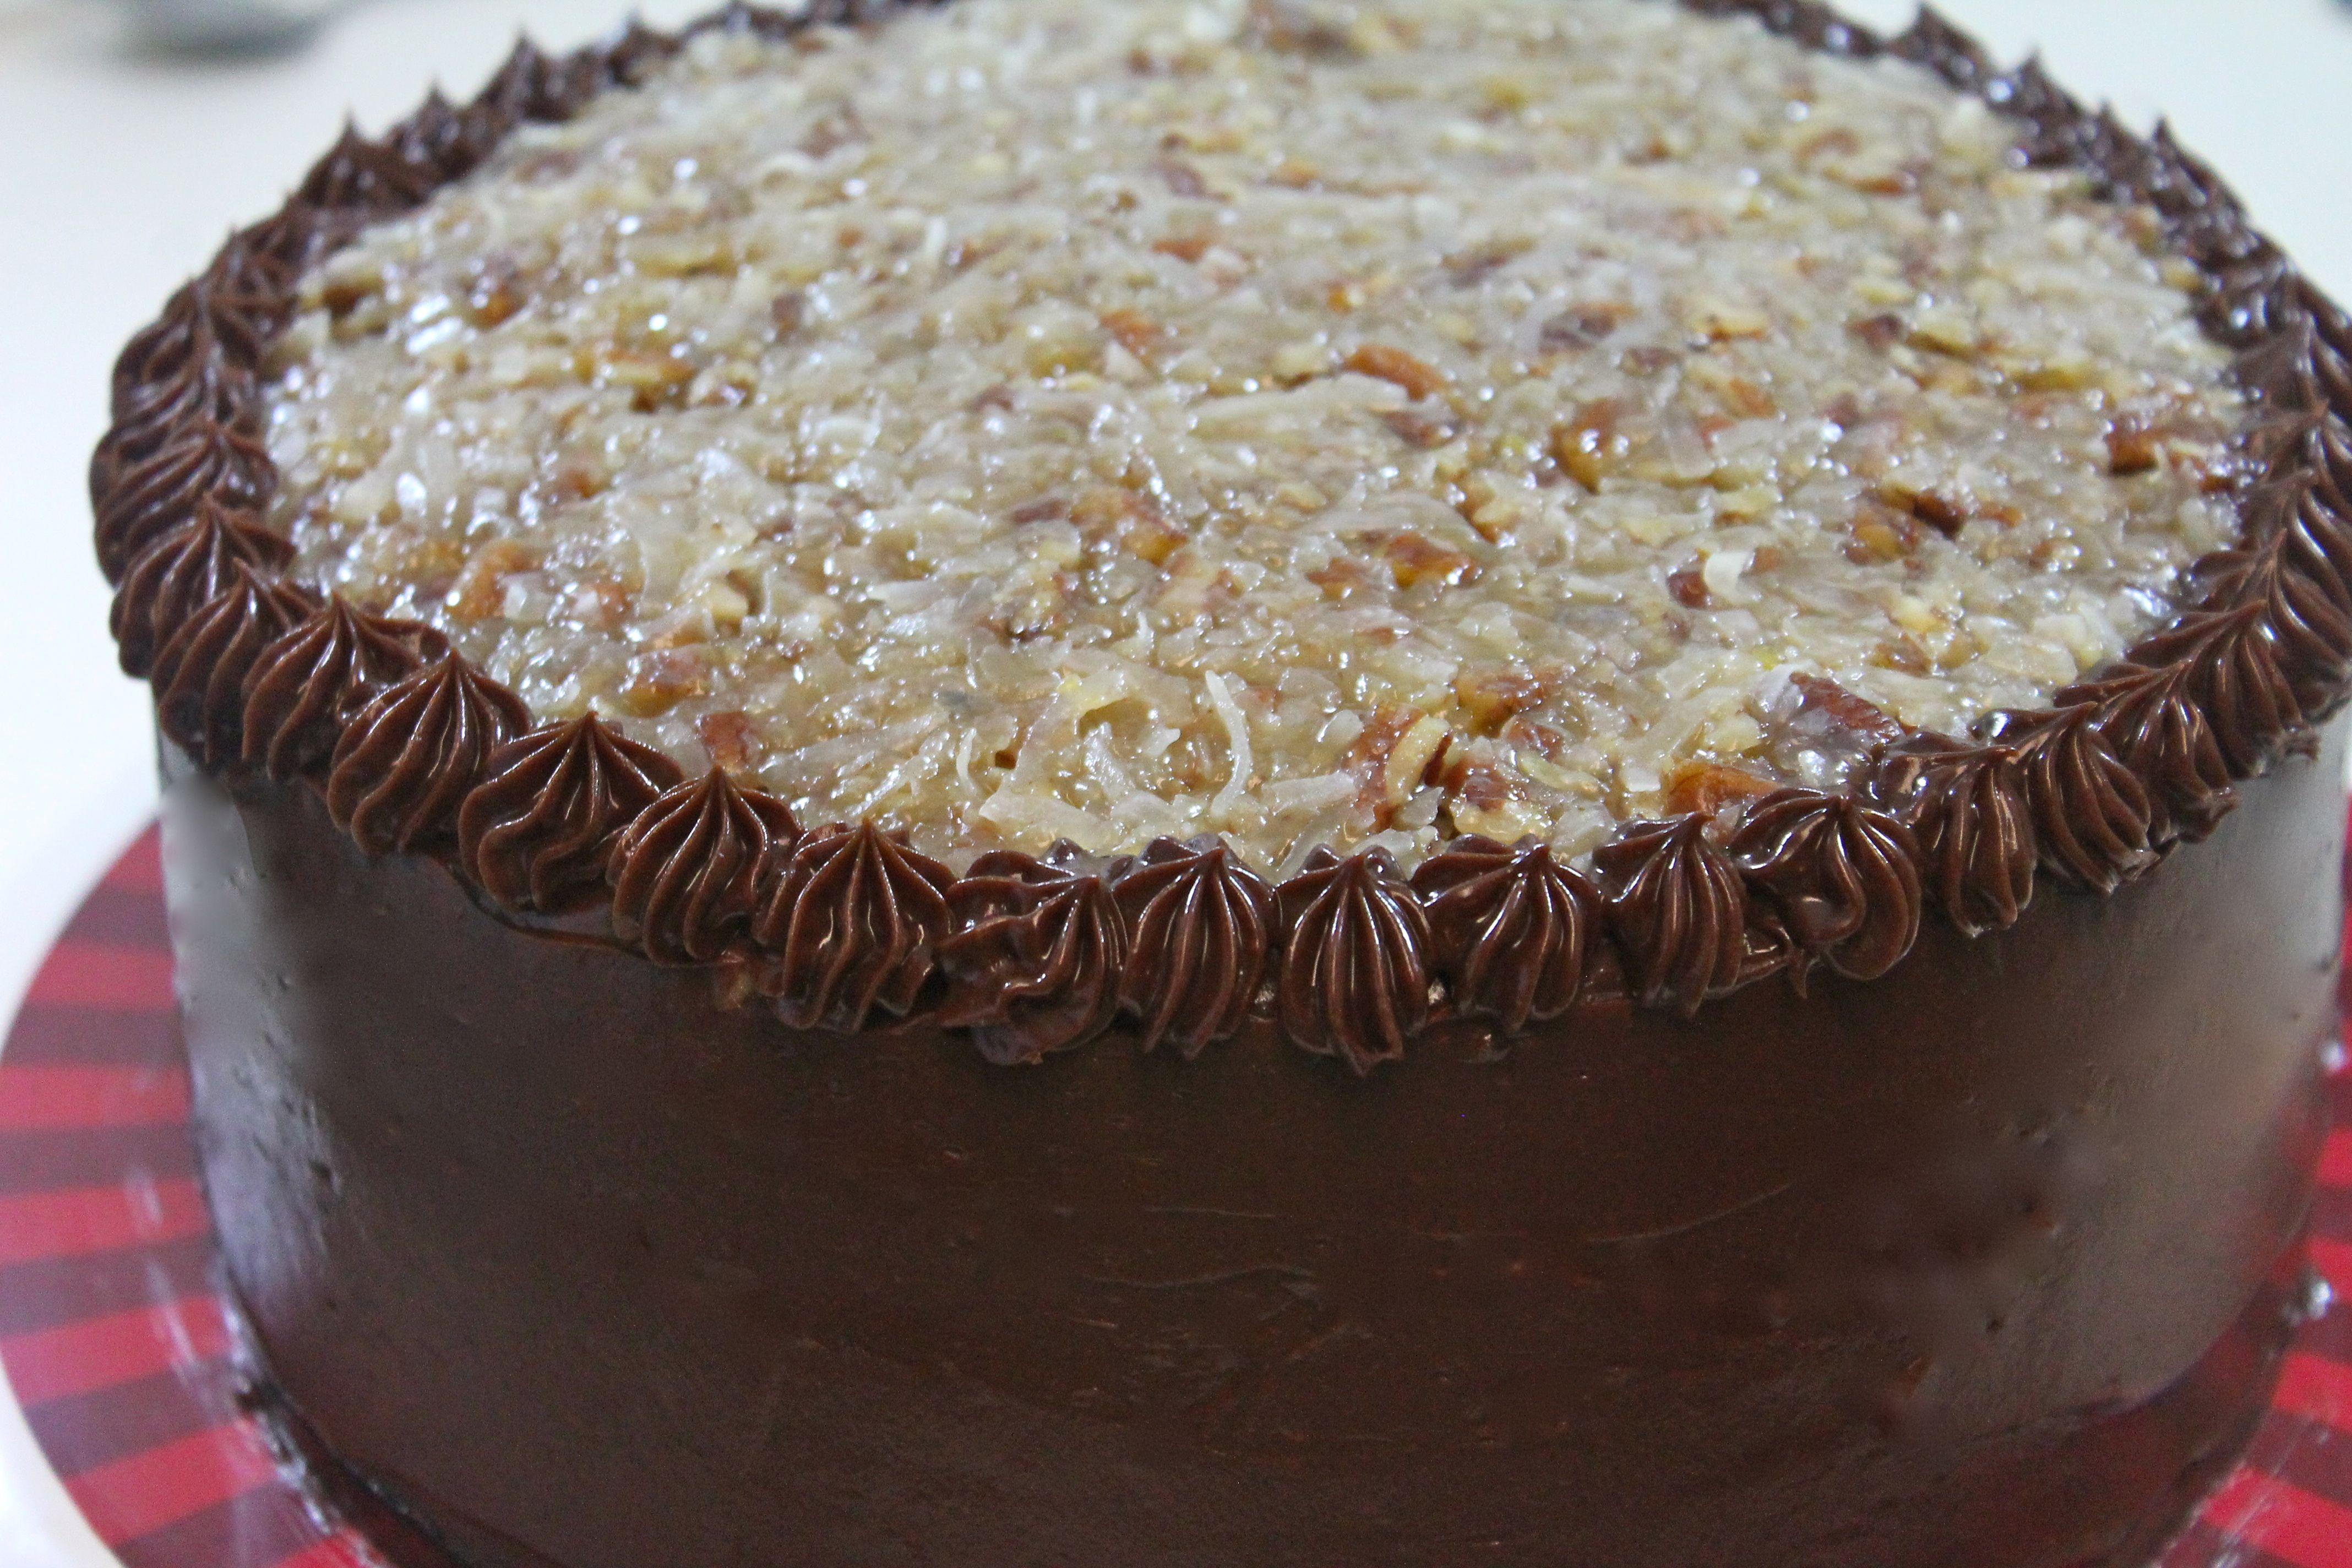 How To Make A German Chocolate Cake More Moist